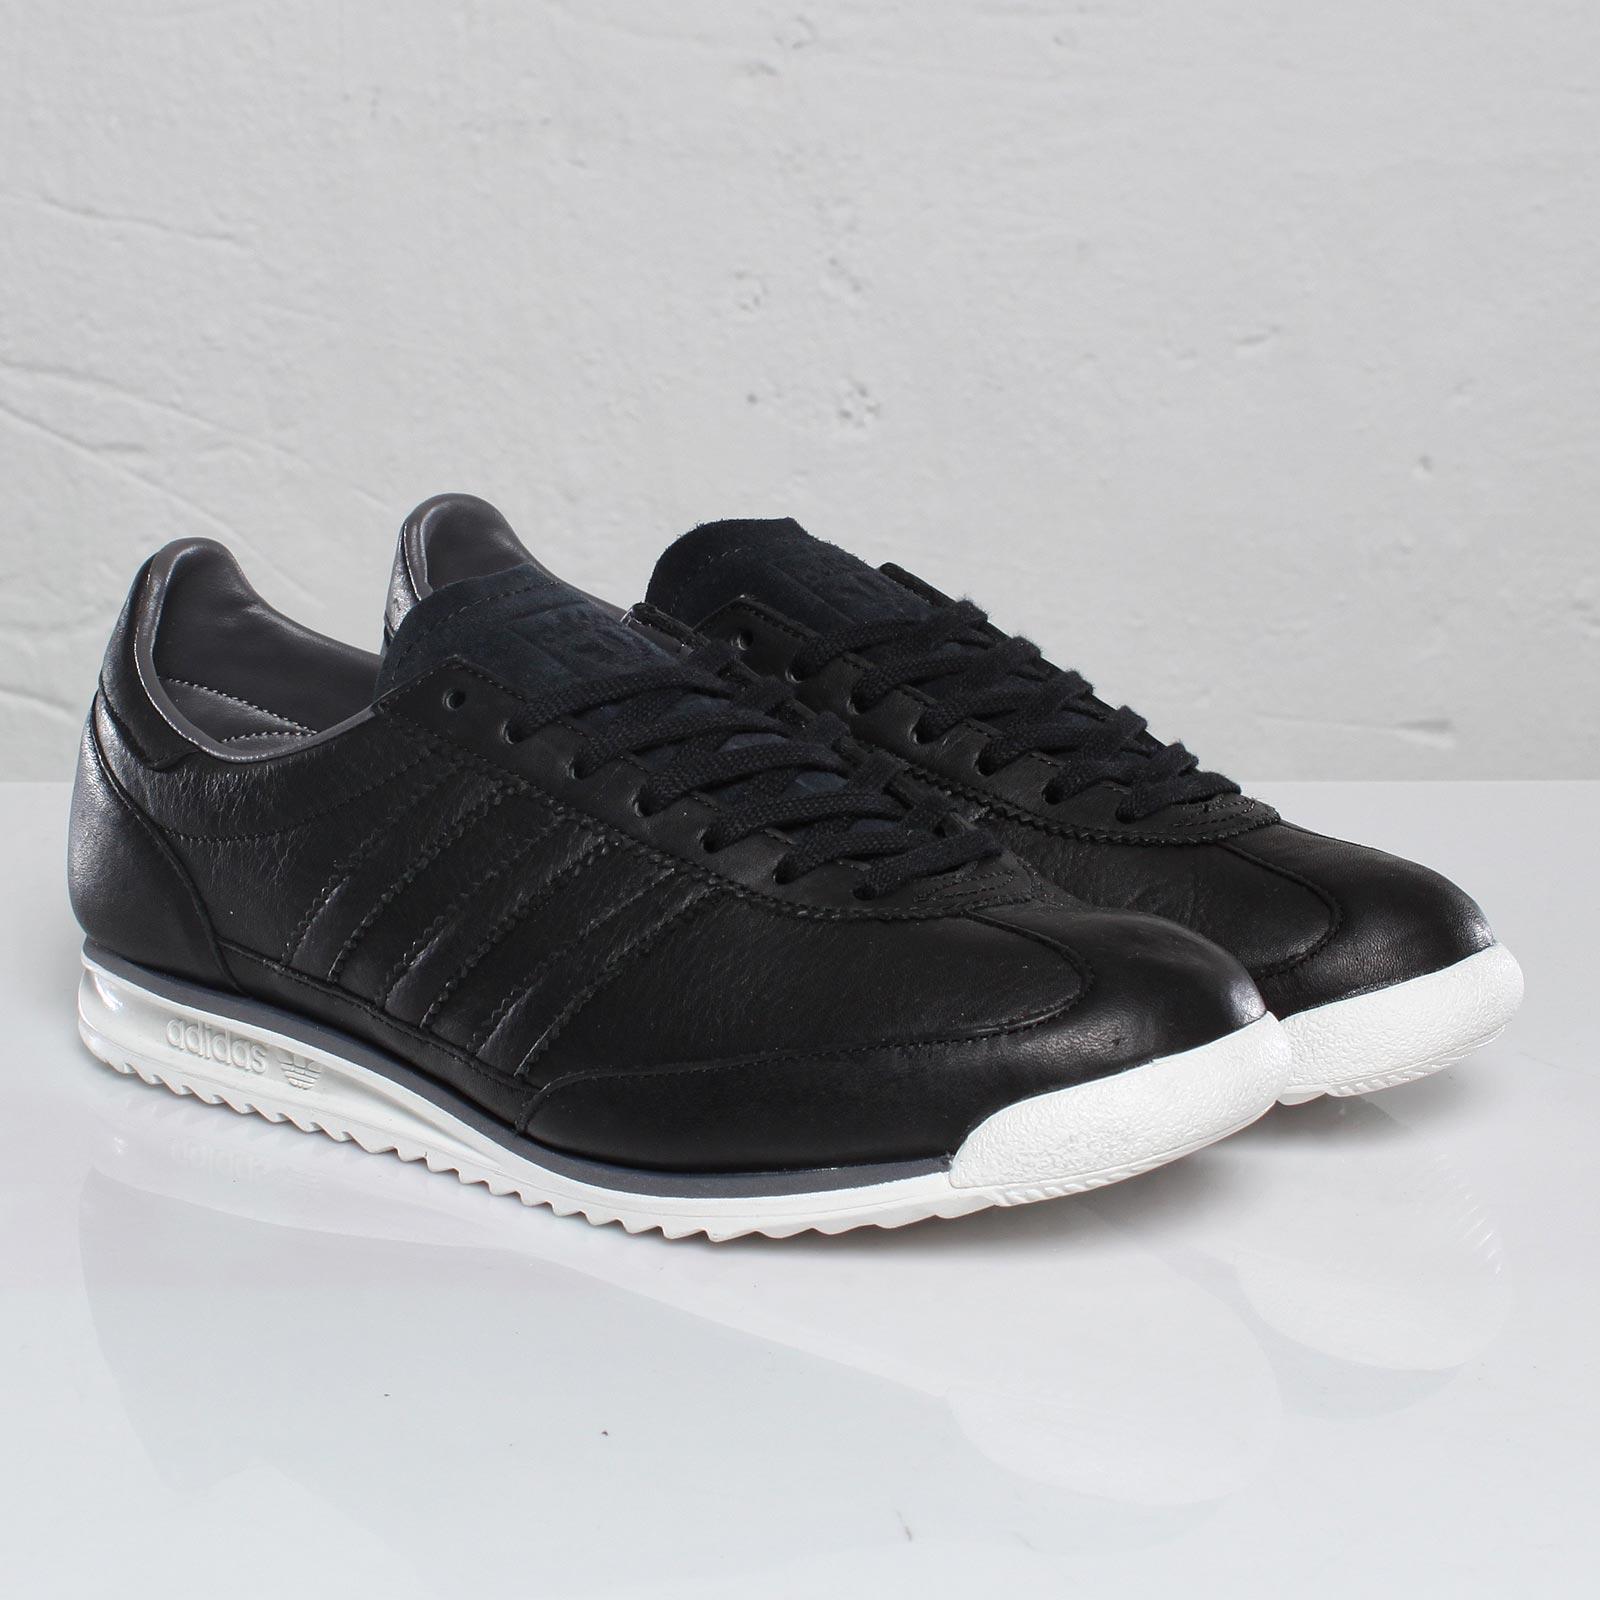 adidas SL 72 - 102308 - Sneakersnstuff